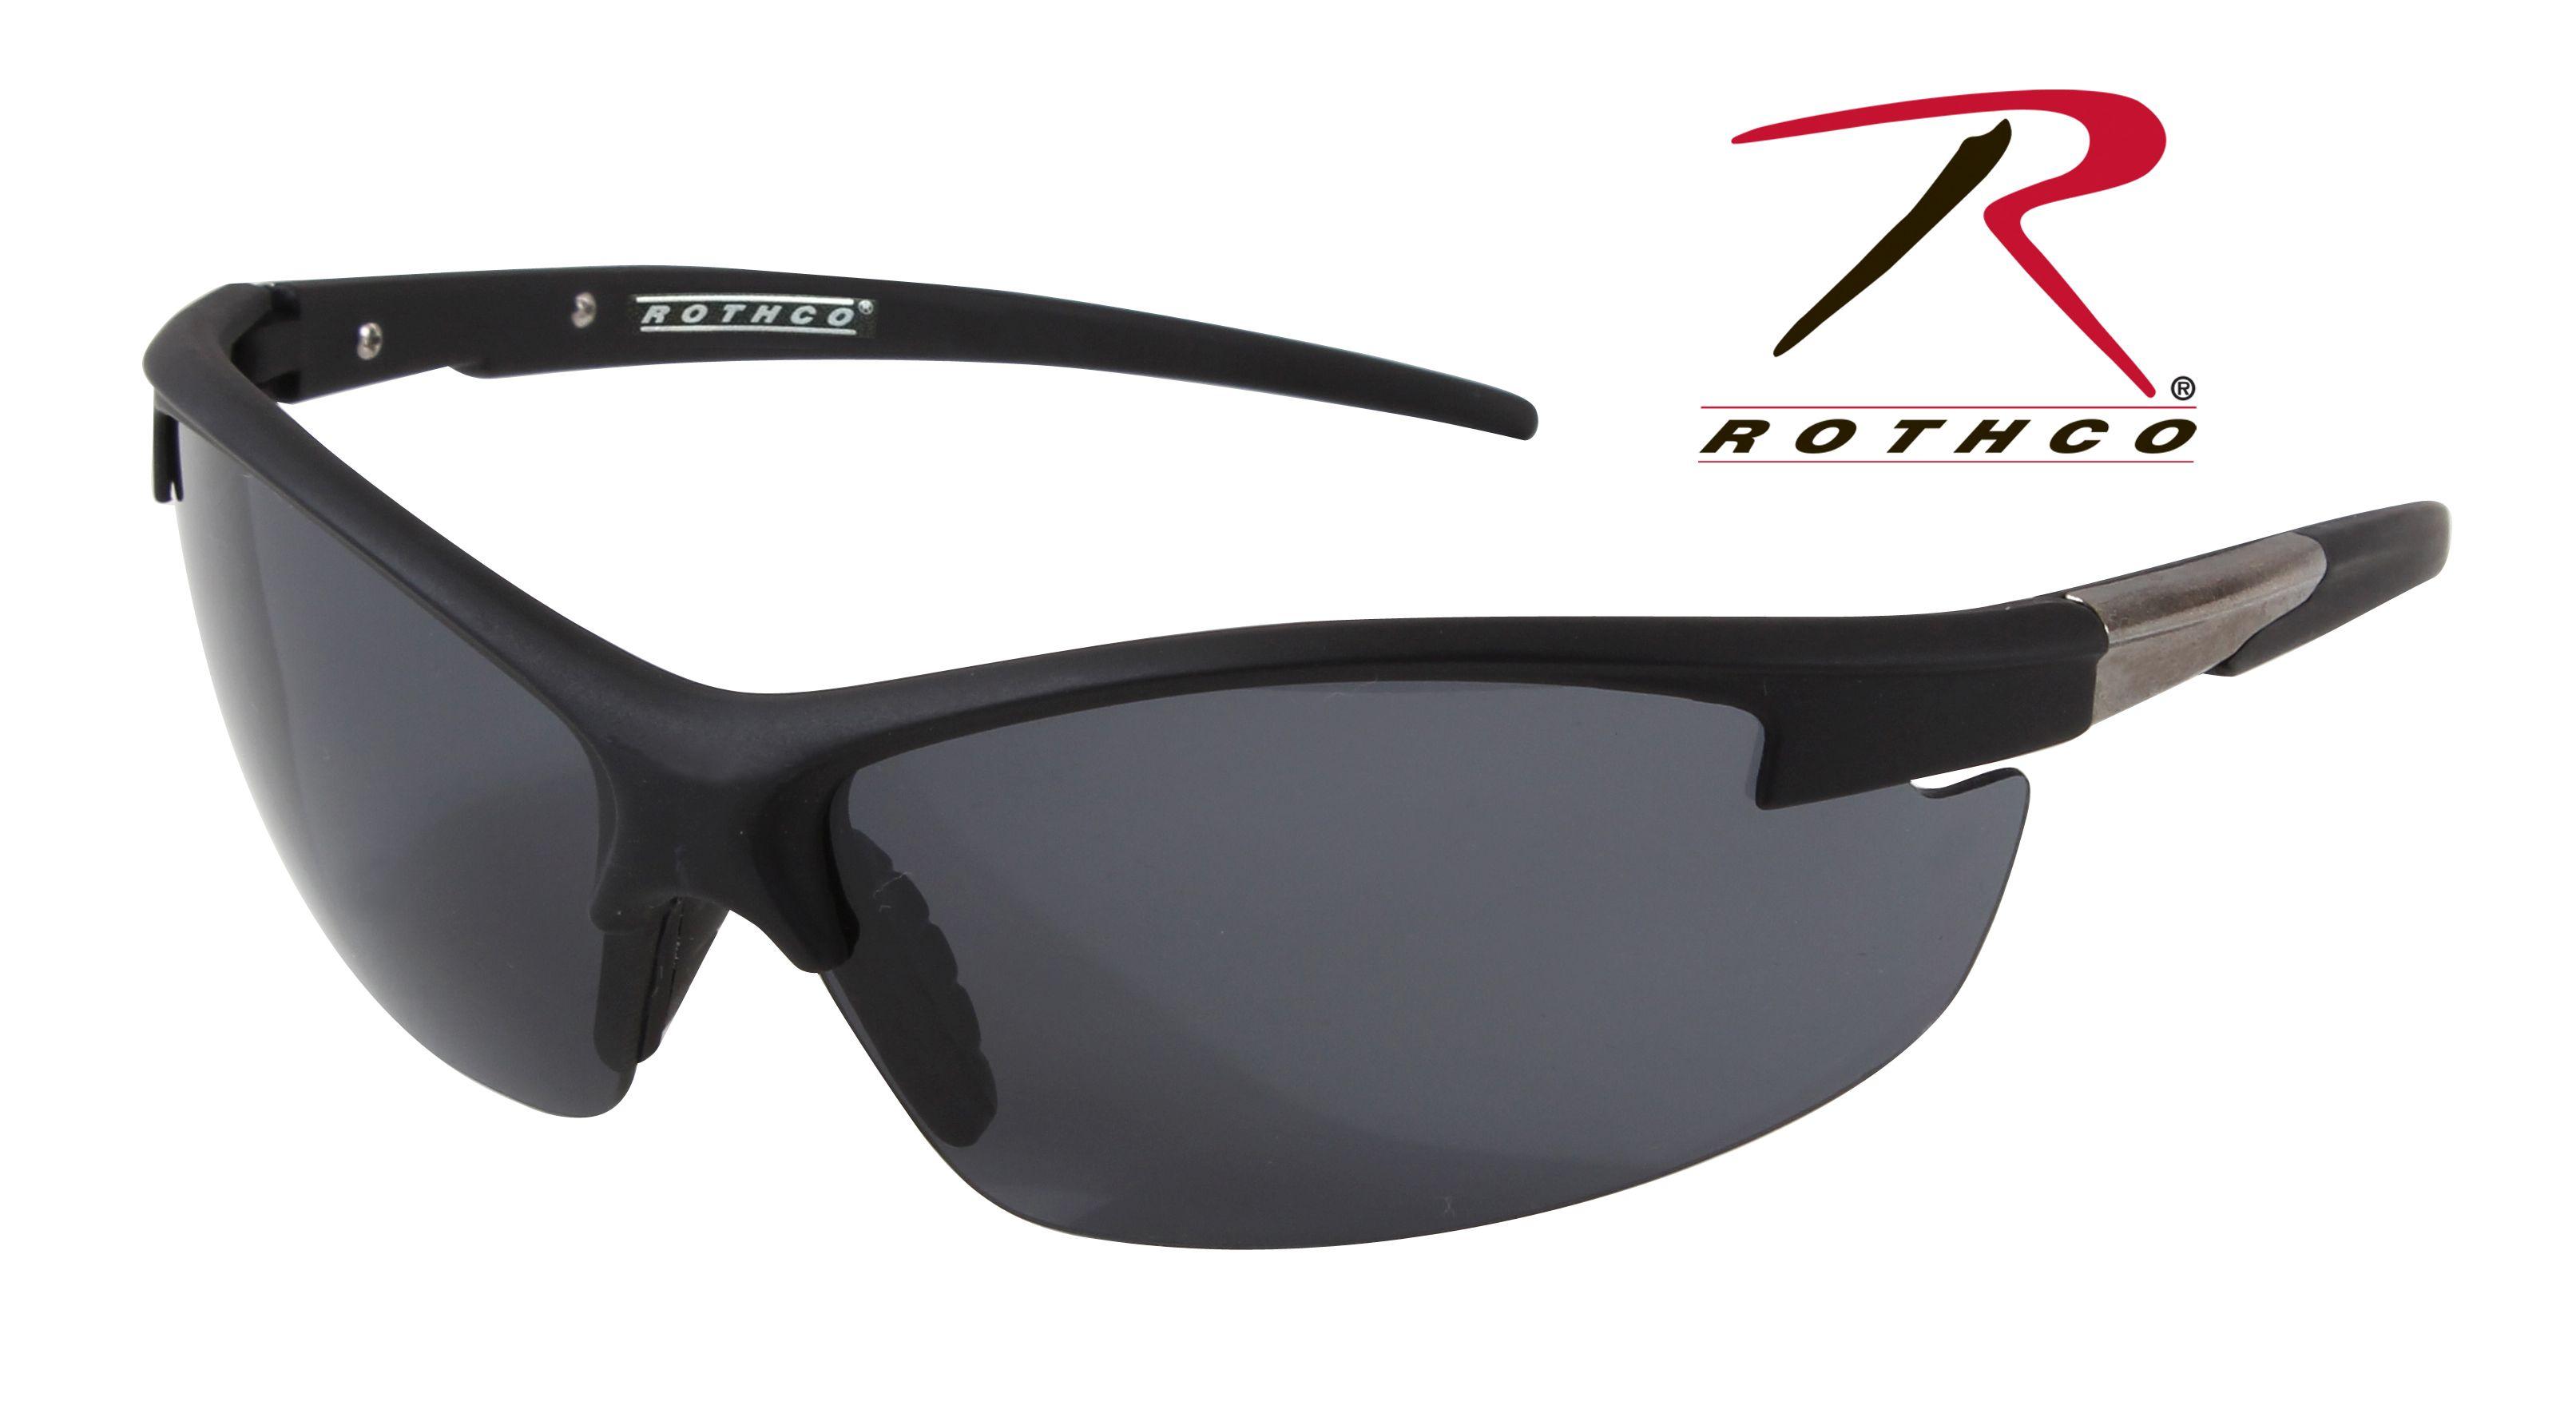 ba3730c04e Buy Rothco AR-7 Sport Glasses - Rothco Online at Best price - TX